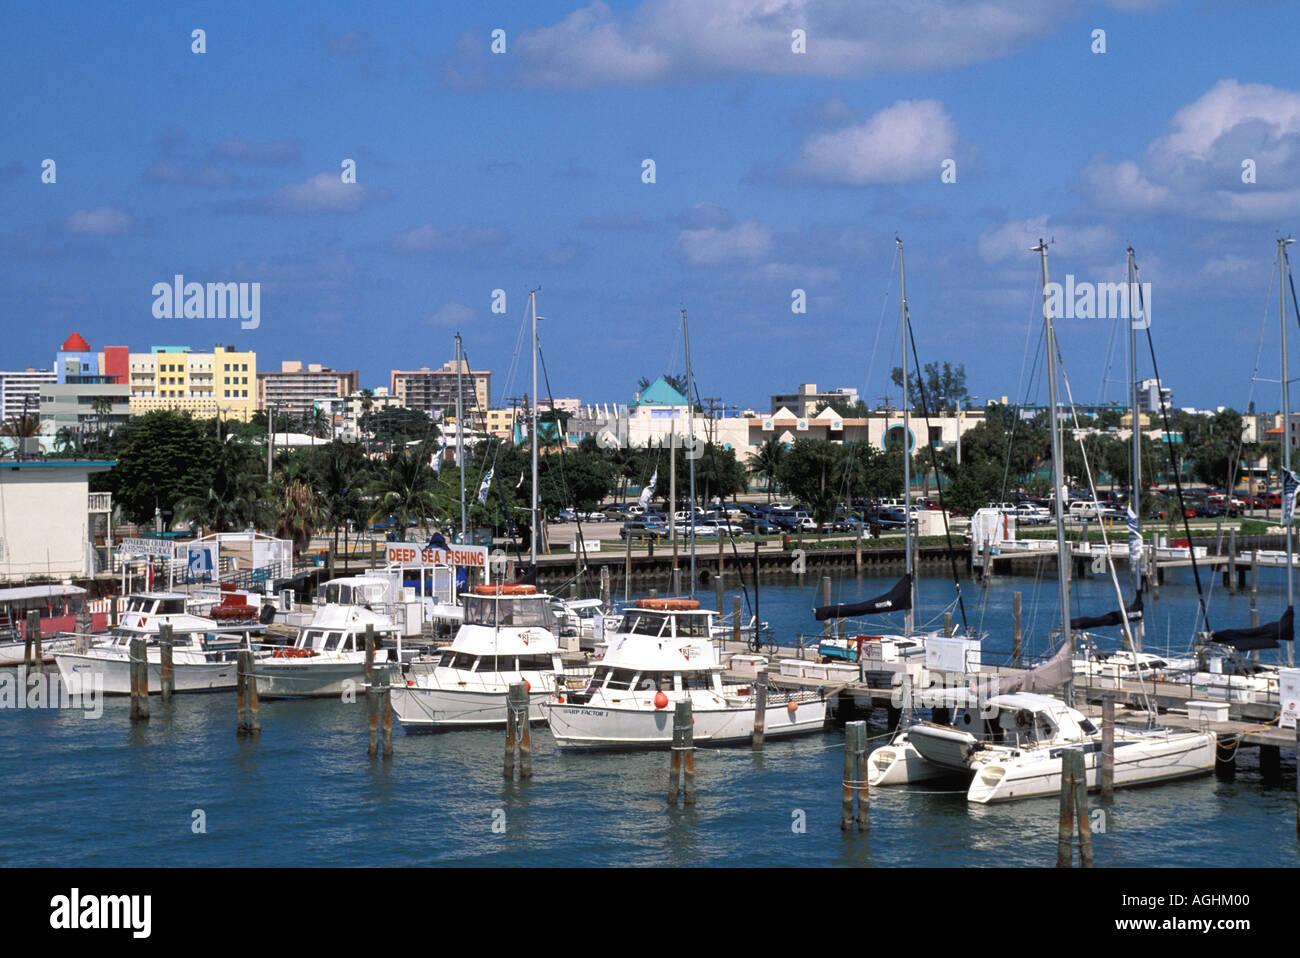 Miami Florida FL South Beach marina with boats at dock skyline behind - Stock Image